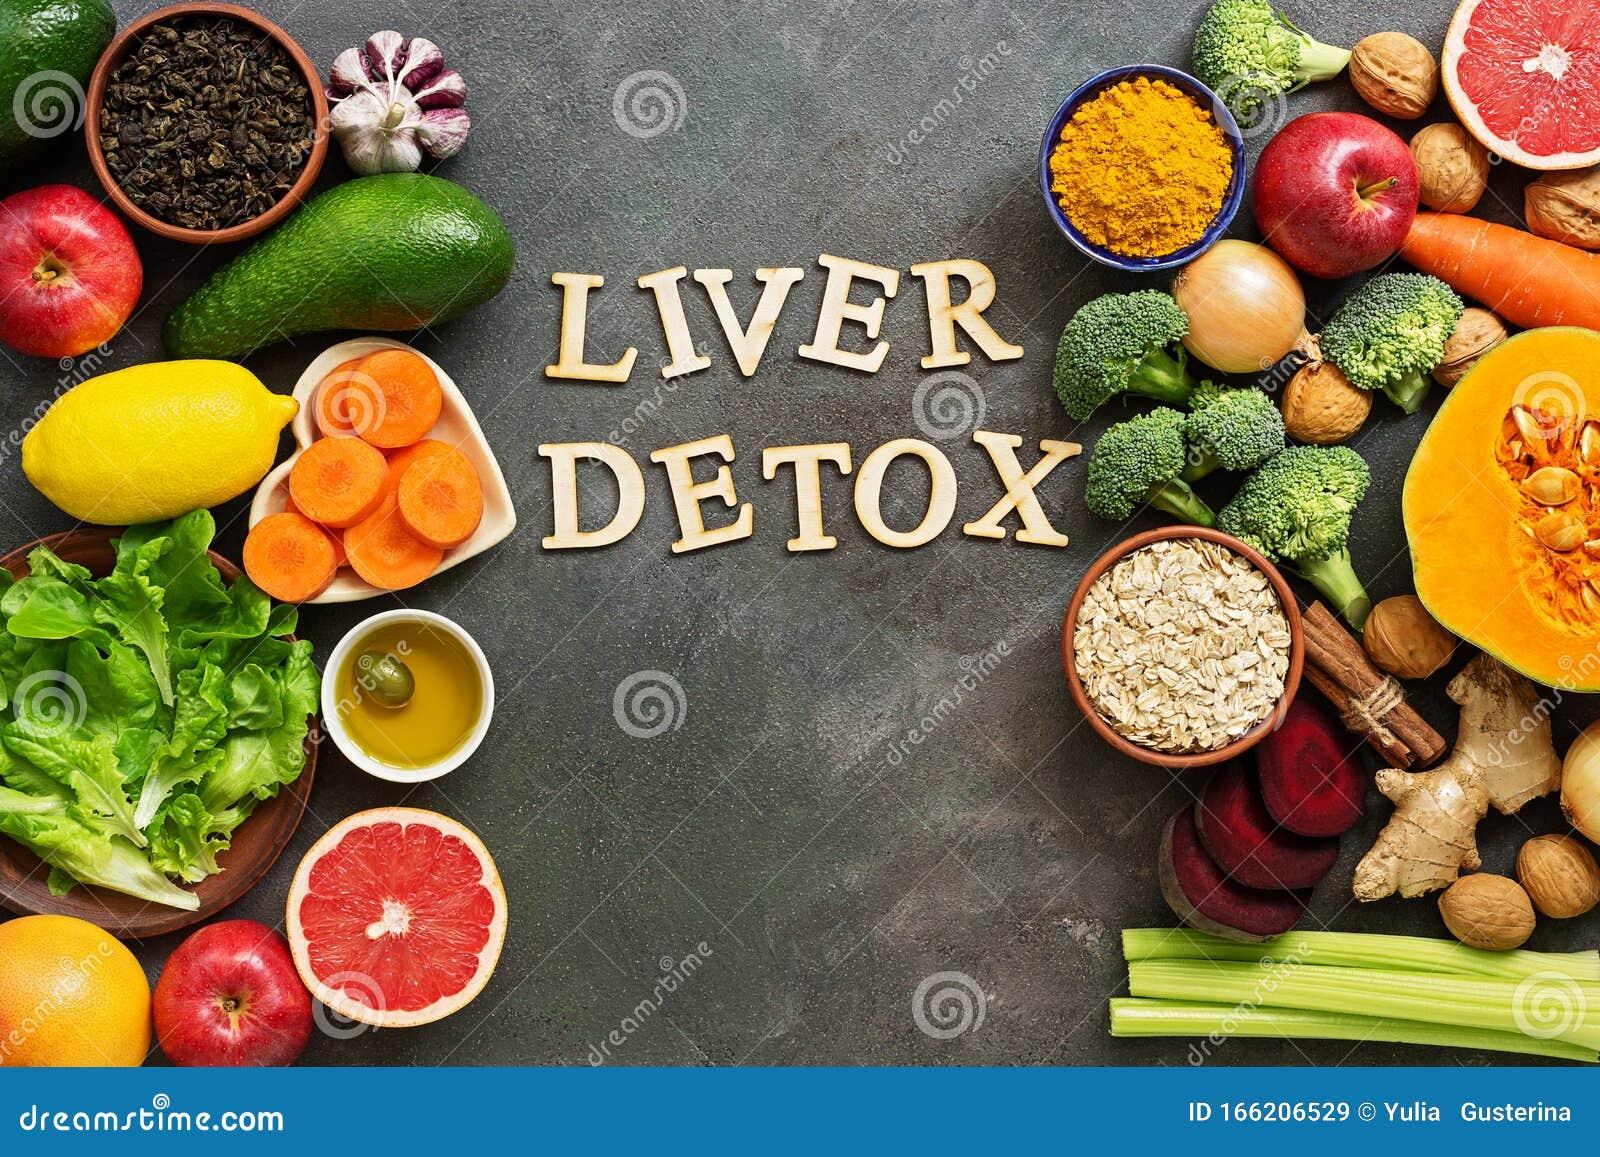 Super Detox - Best Colon Cleanse Weight Loss Diet Pills For Women w/ Probiotics - p5net.ro